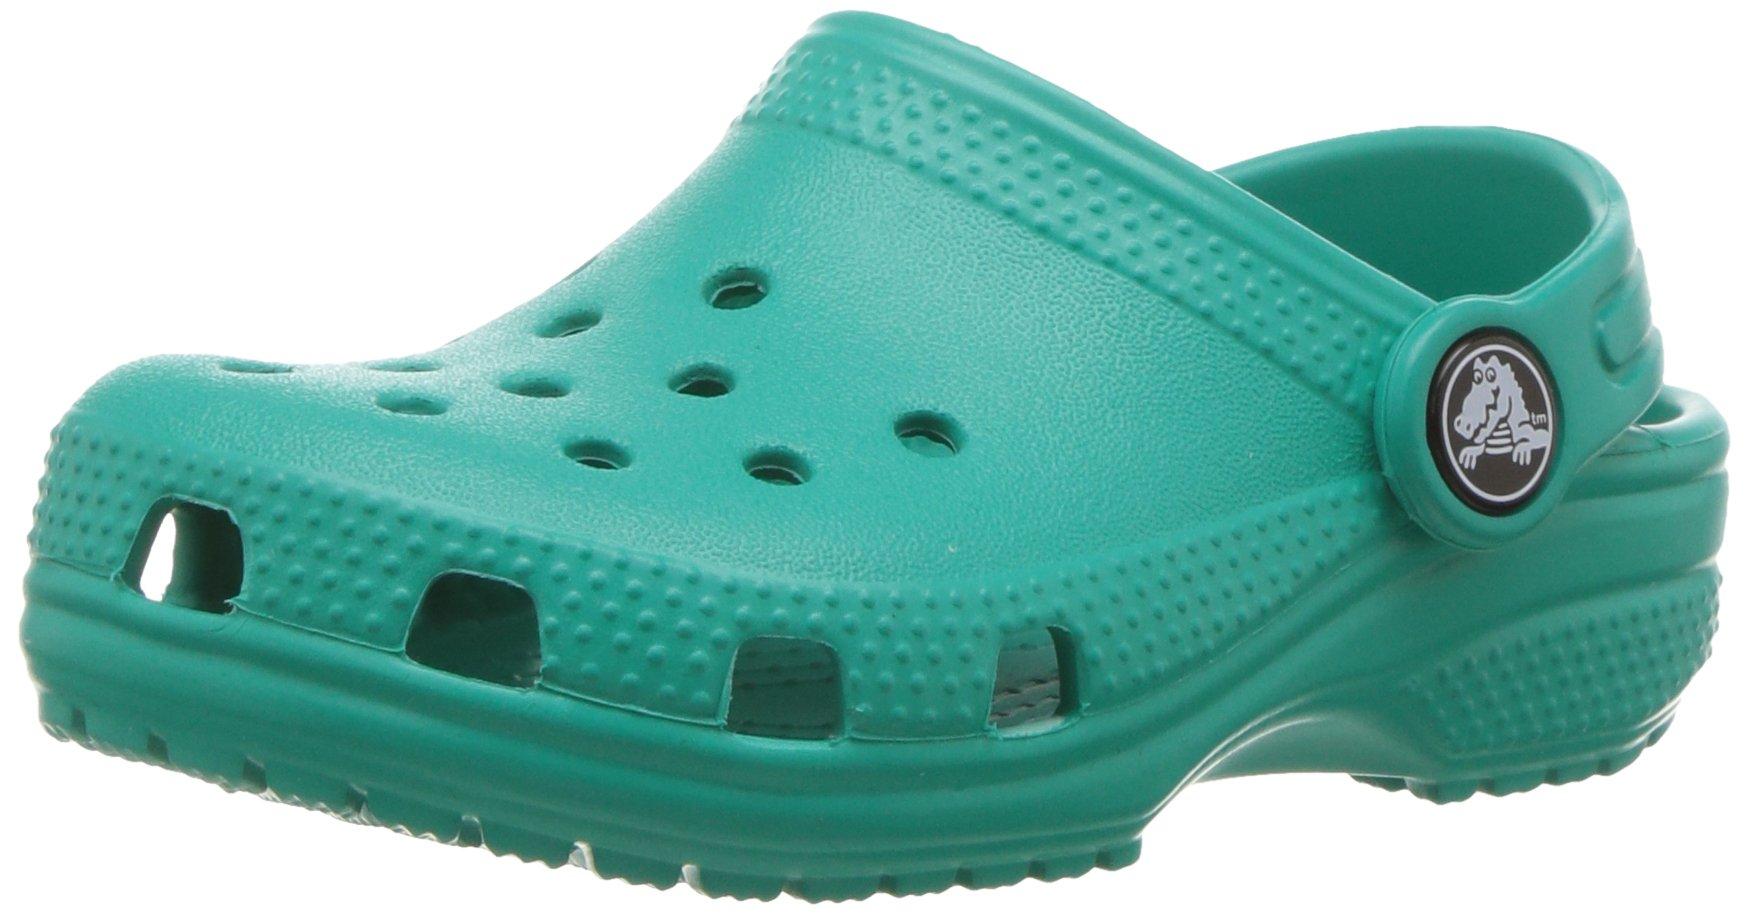 Crocs Kid's Classic Clog K Shoe, Tropical Teal, 3 M US Little Kid